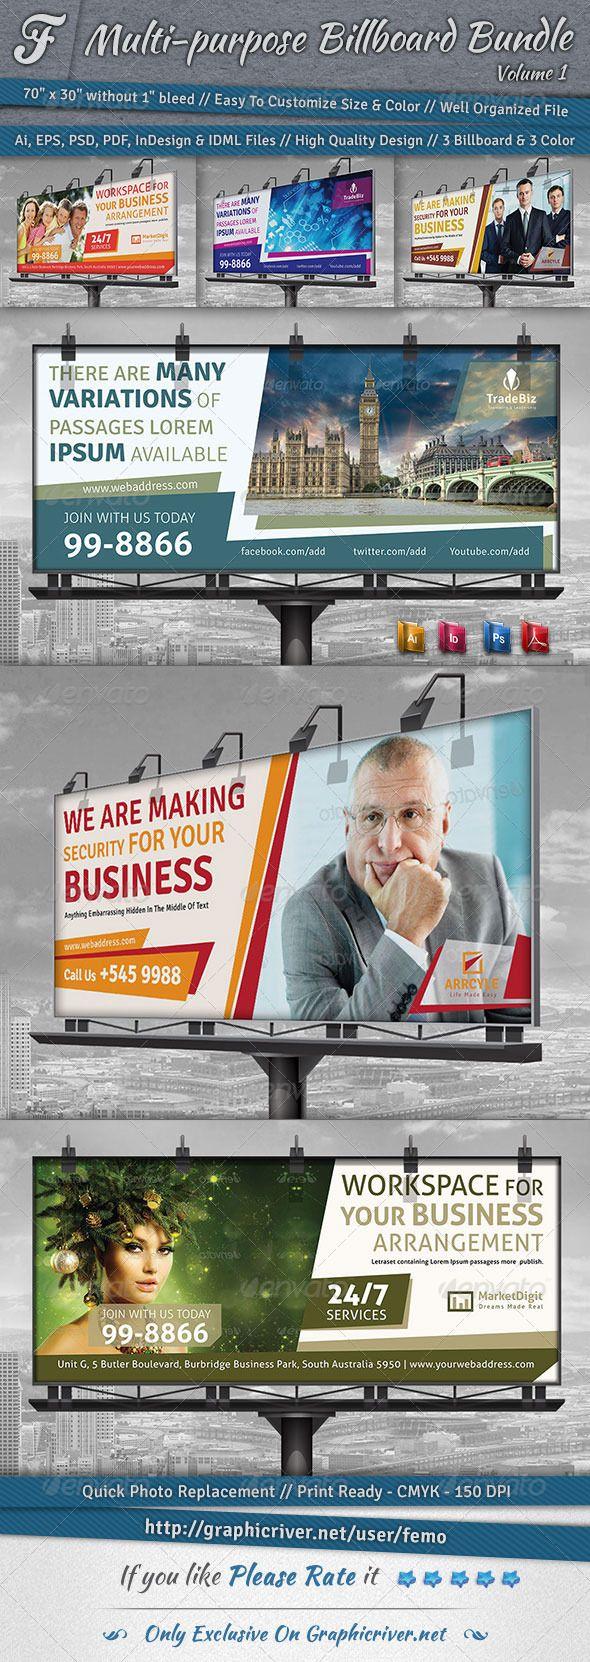 Real estate billboard design samples - Multi Purpose Billboard Bundle Volume 1 Real Estate Servicesai Illustratorsignage Designhealth Insuranceprint Templatesbusiness